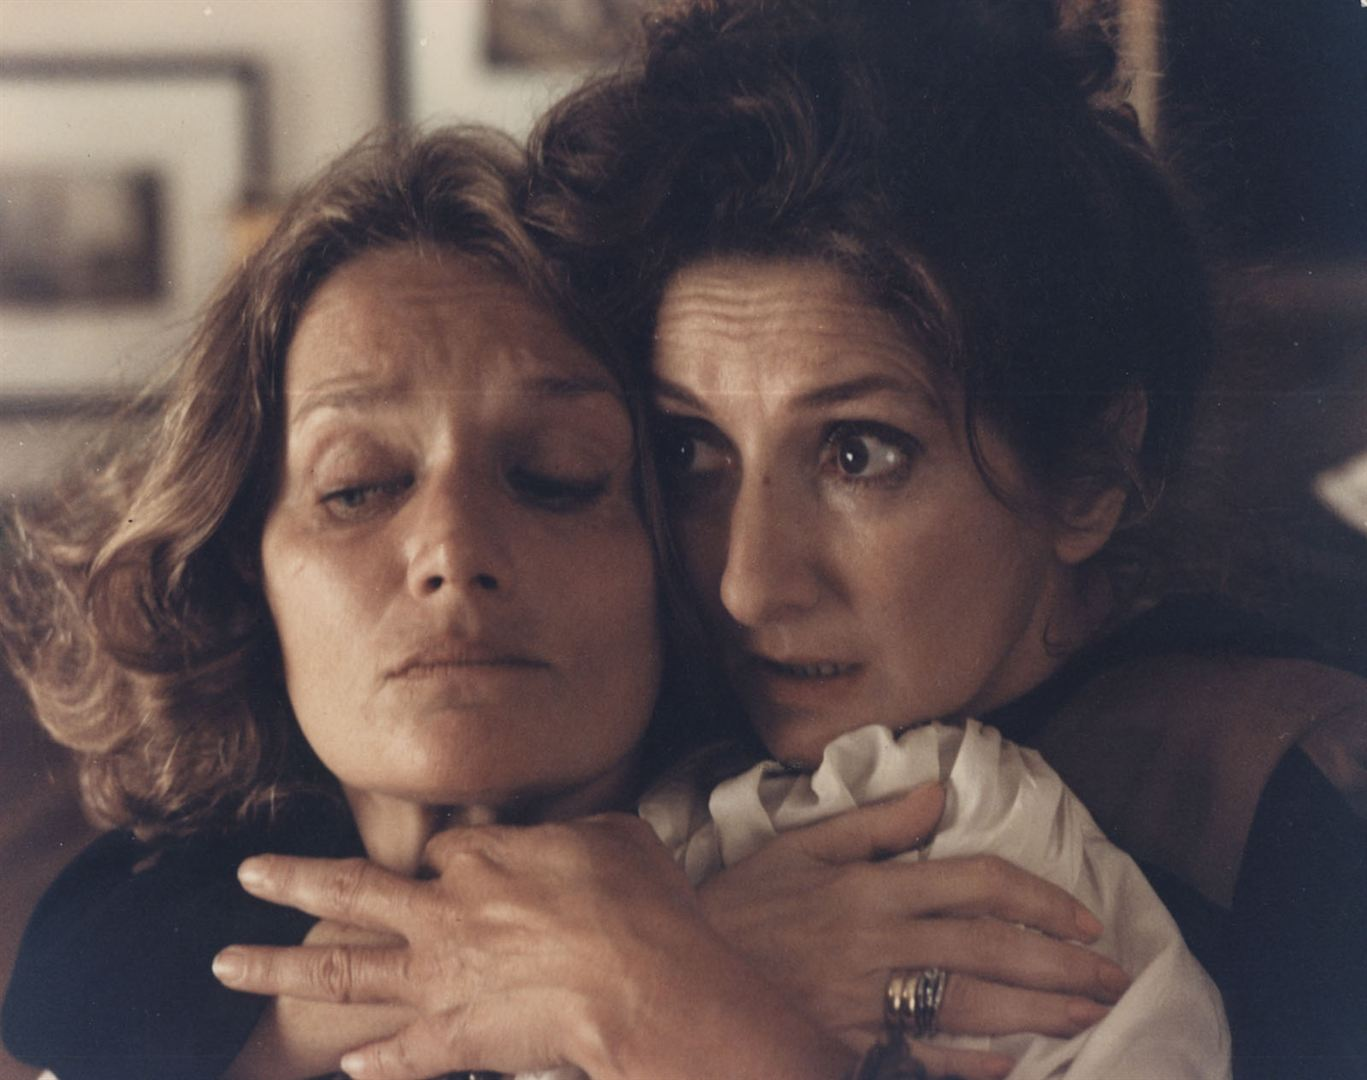 Ana (Chunchuna Villafane) et Alicia (Norma Aleandro)